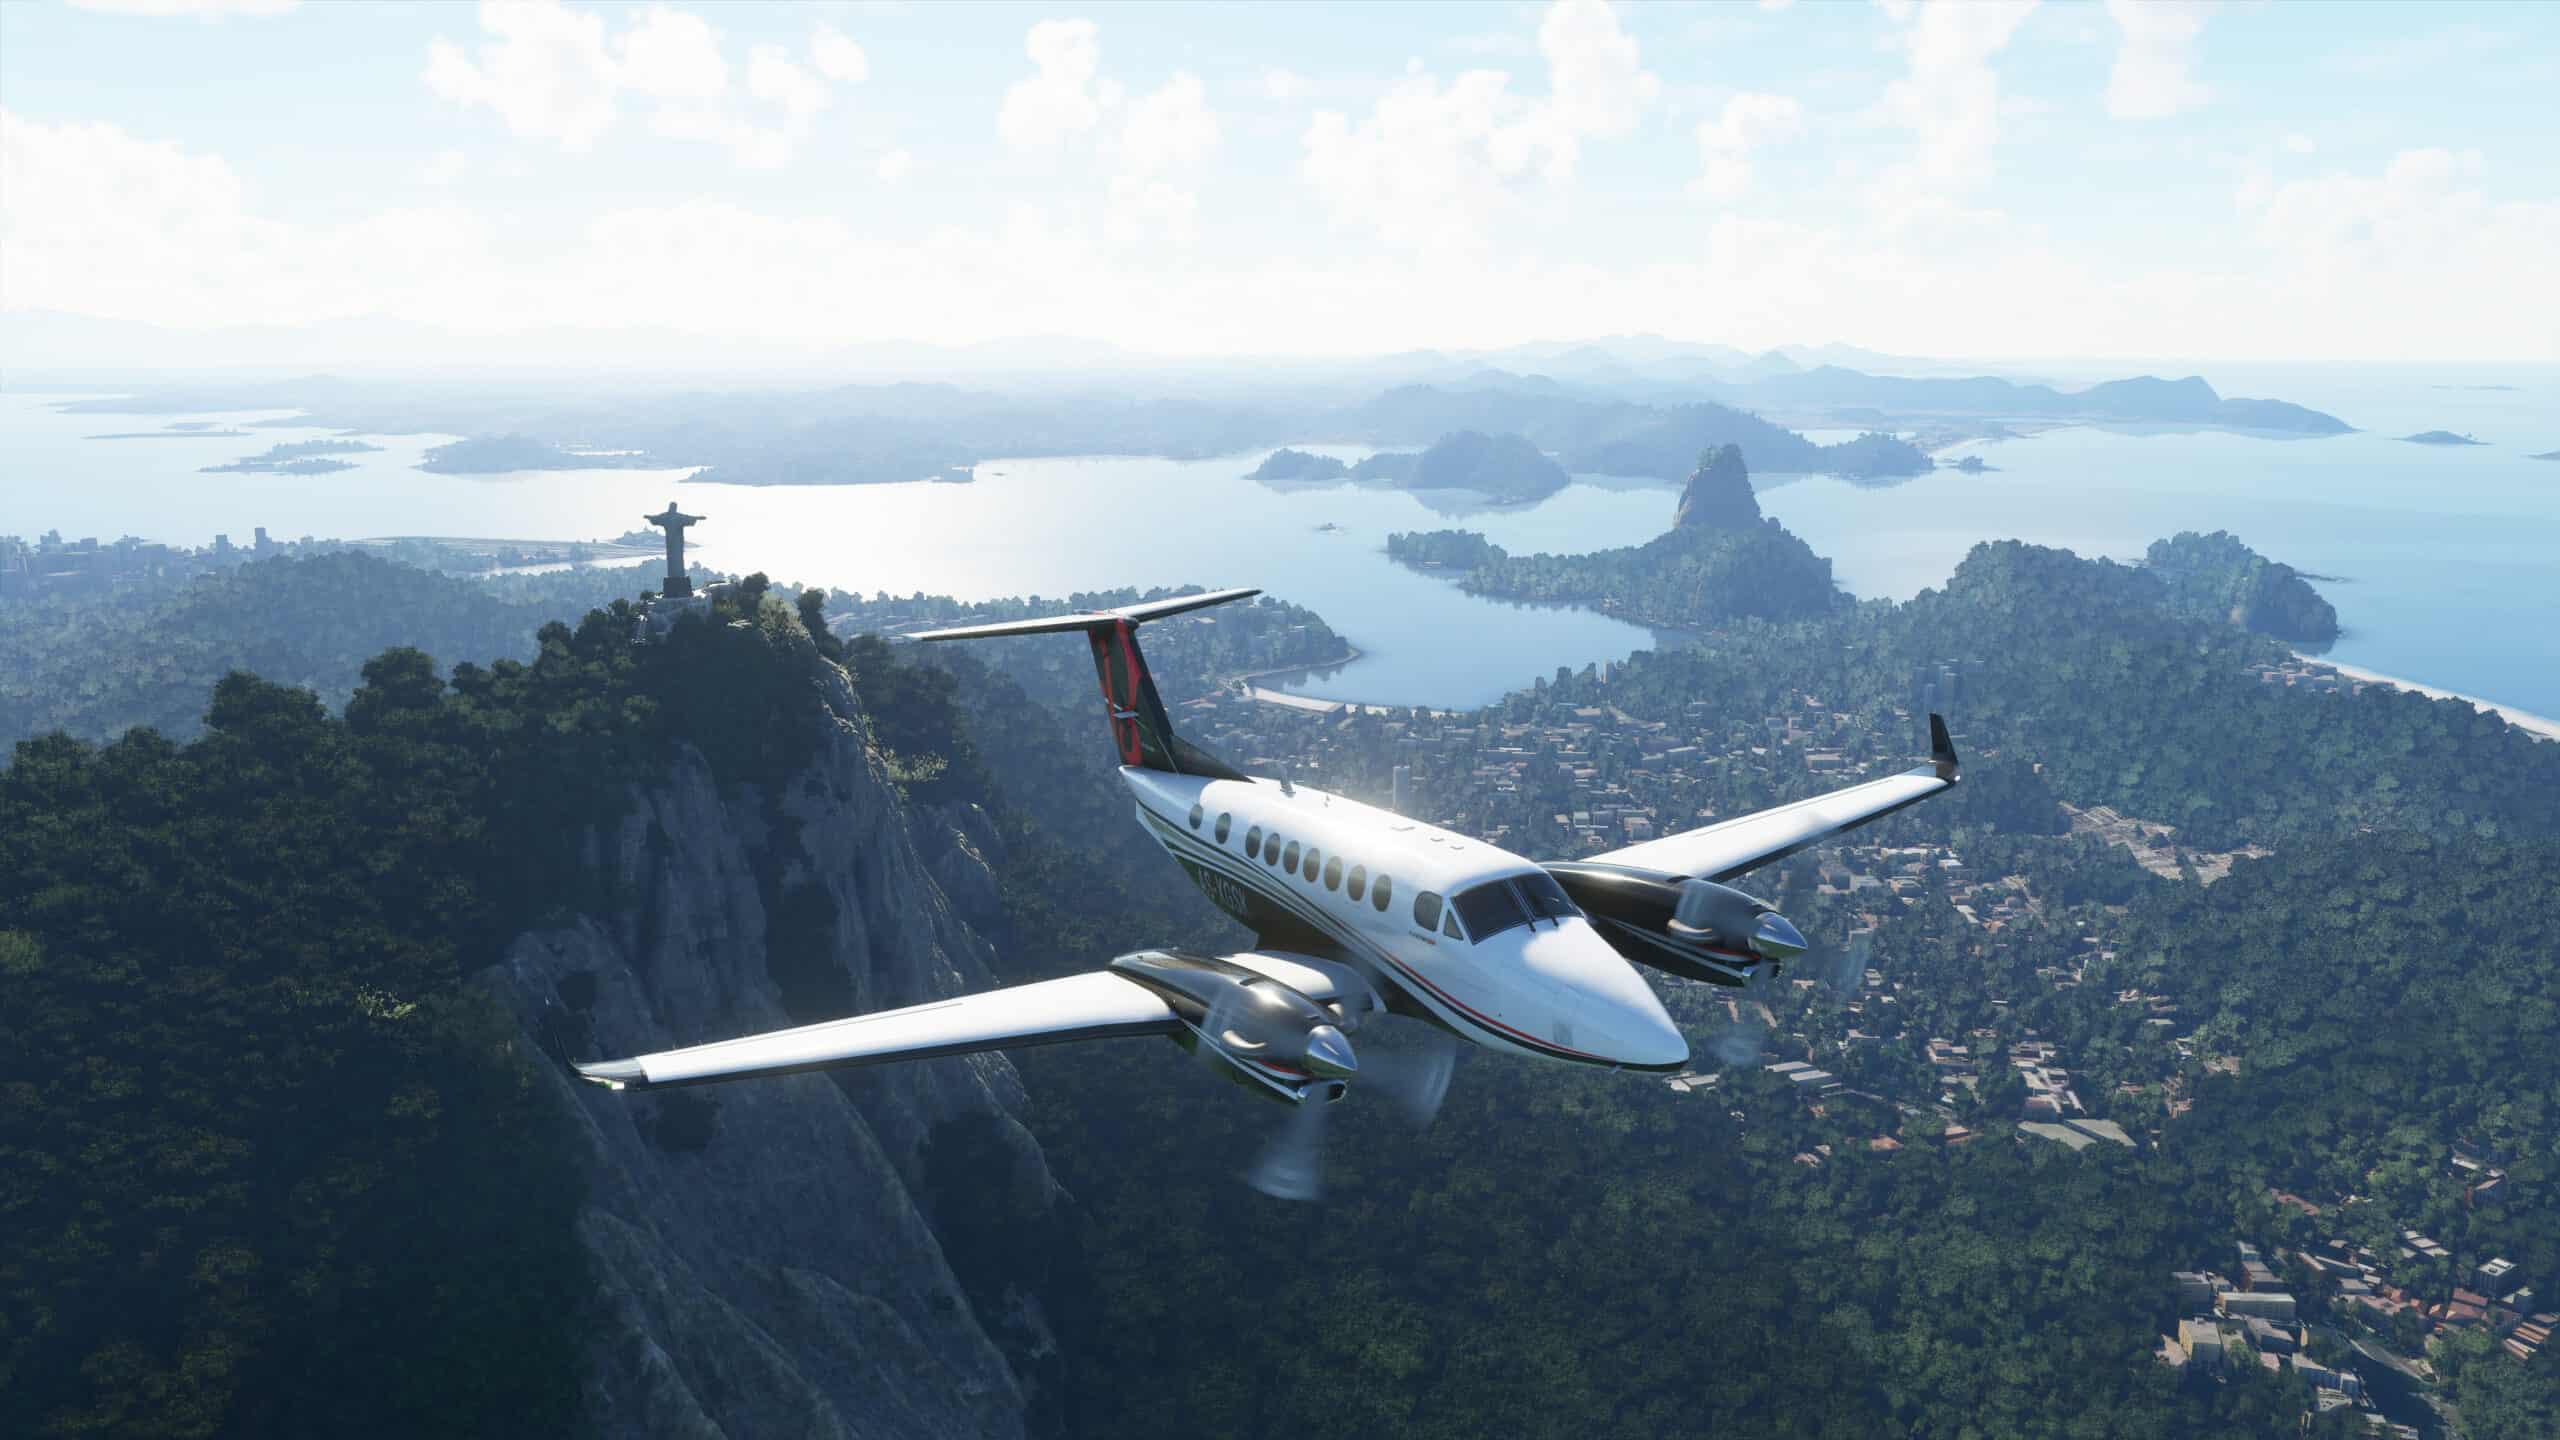 Mogelijk gemist: Microsoft Flight Simulator 2020